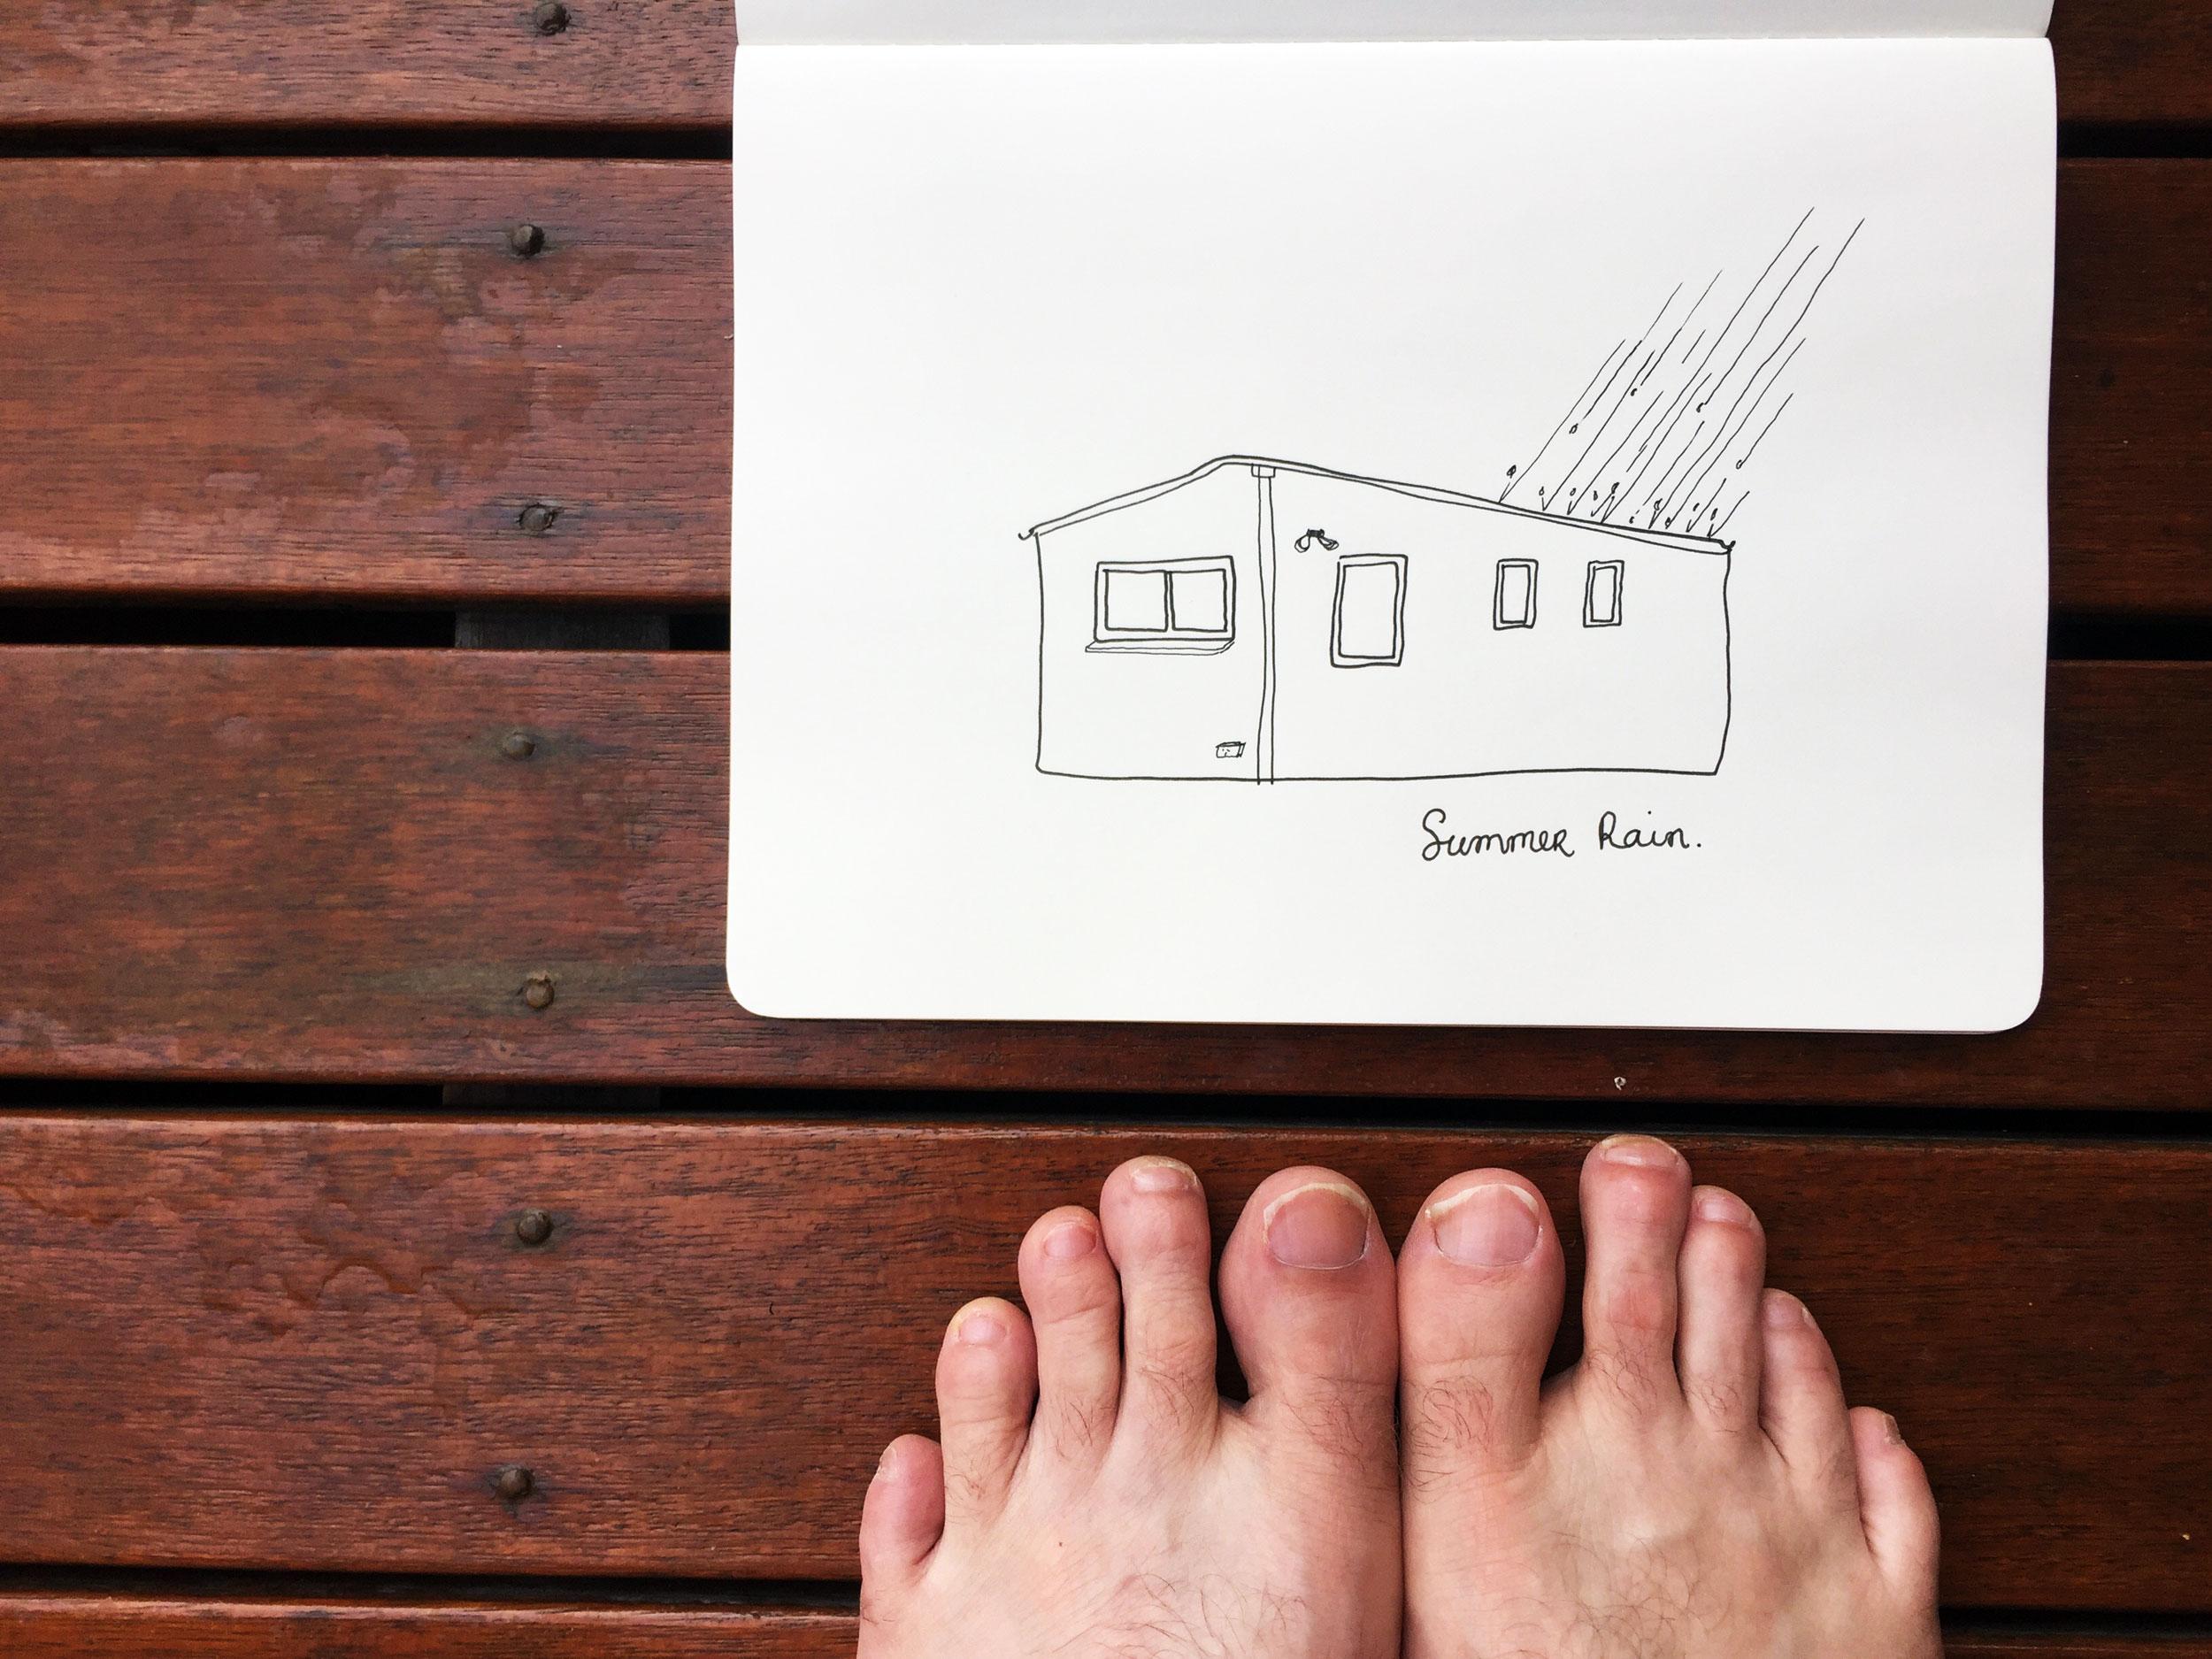 Summer rain. Drawing Luke Hockley.